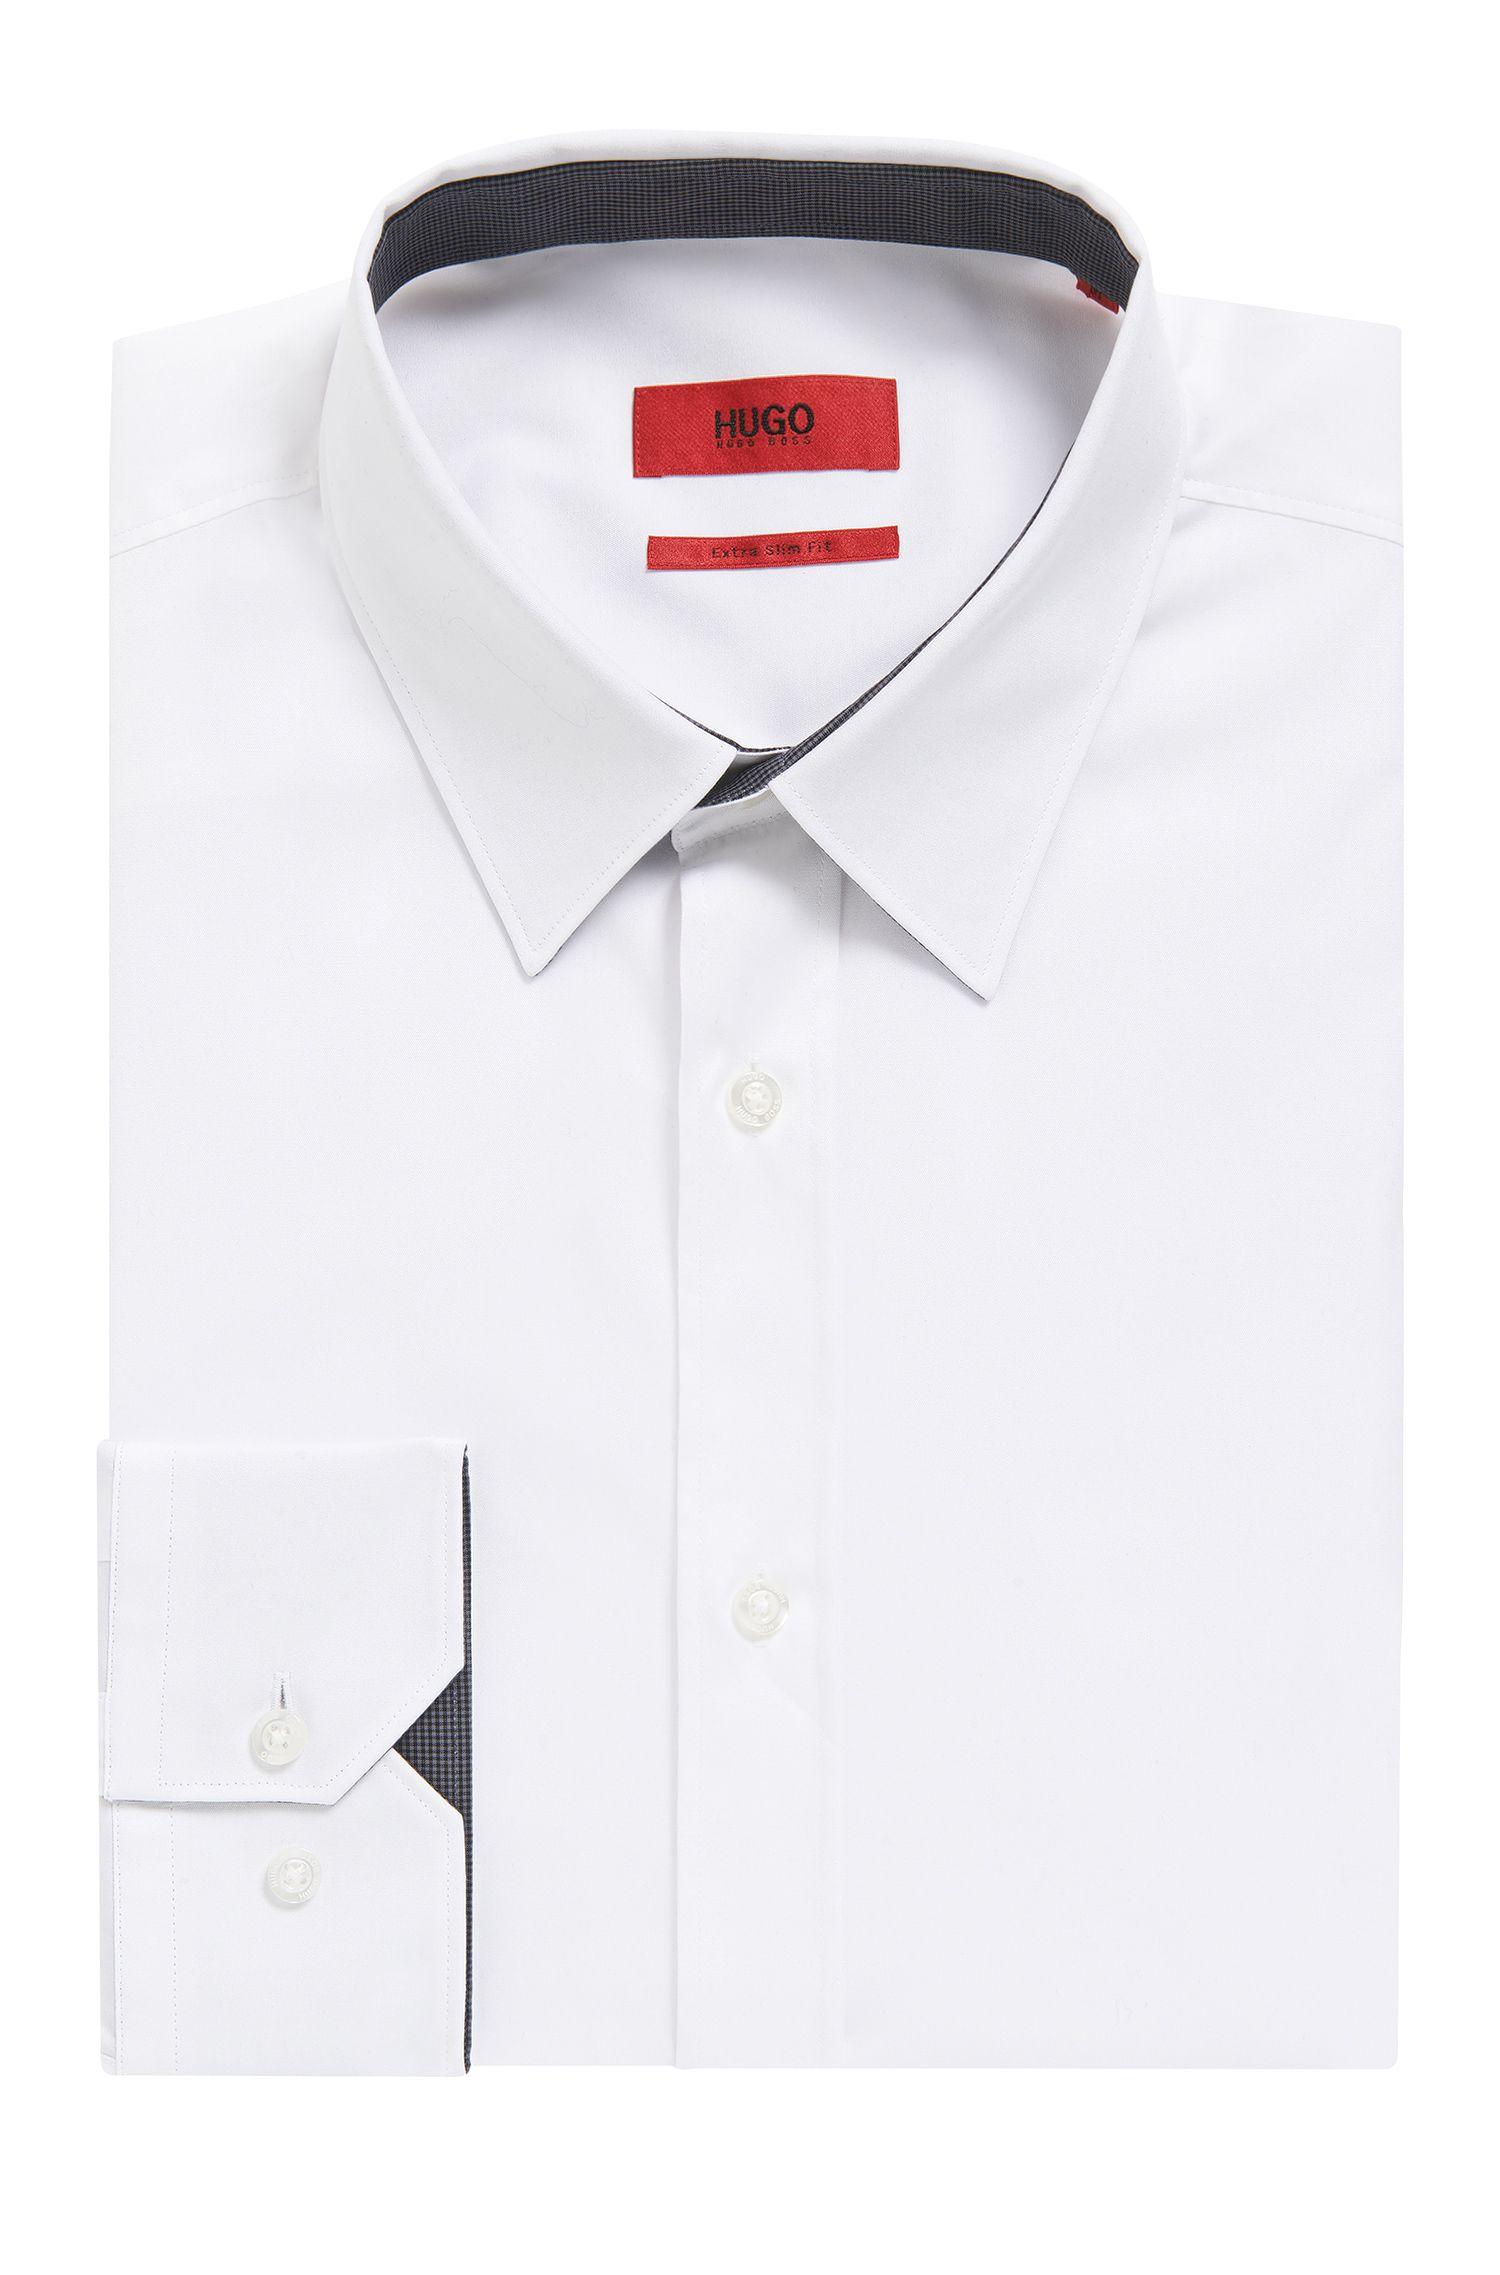 Cotton Easy Iron Button Down Shirt, Extra Slim Fit | Elisha